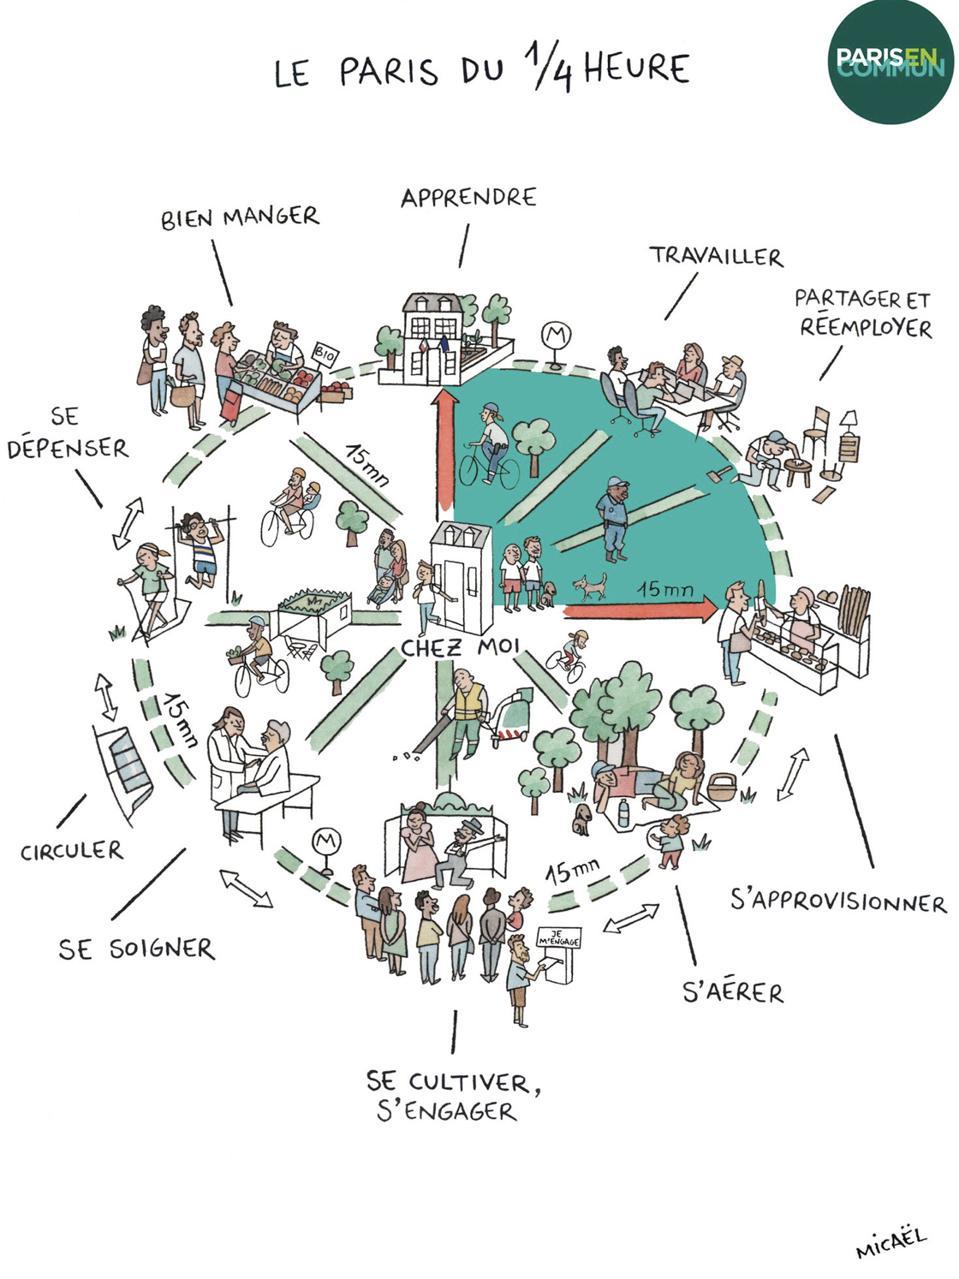 VilleDuQuartDHeure